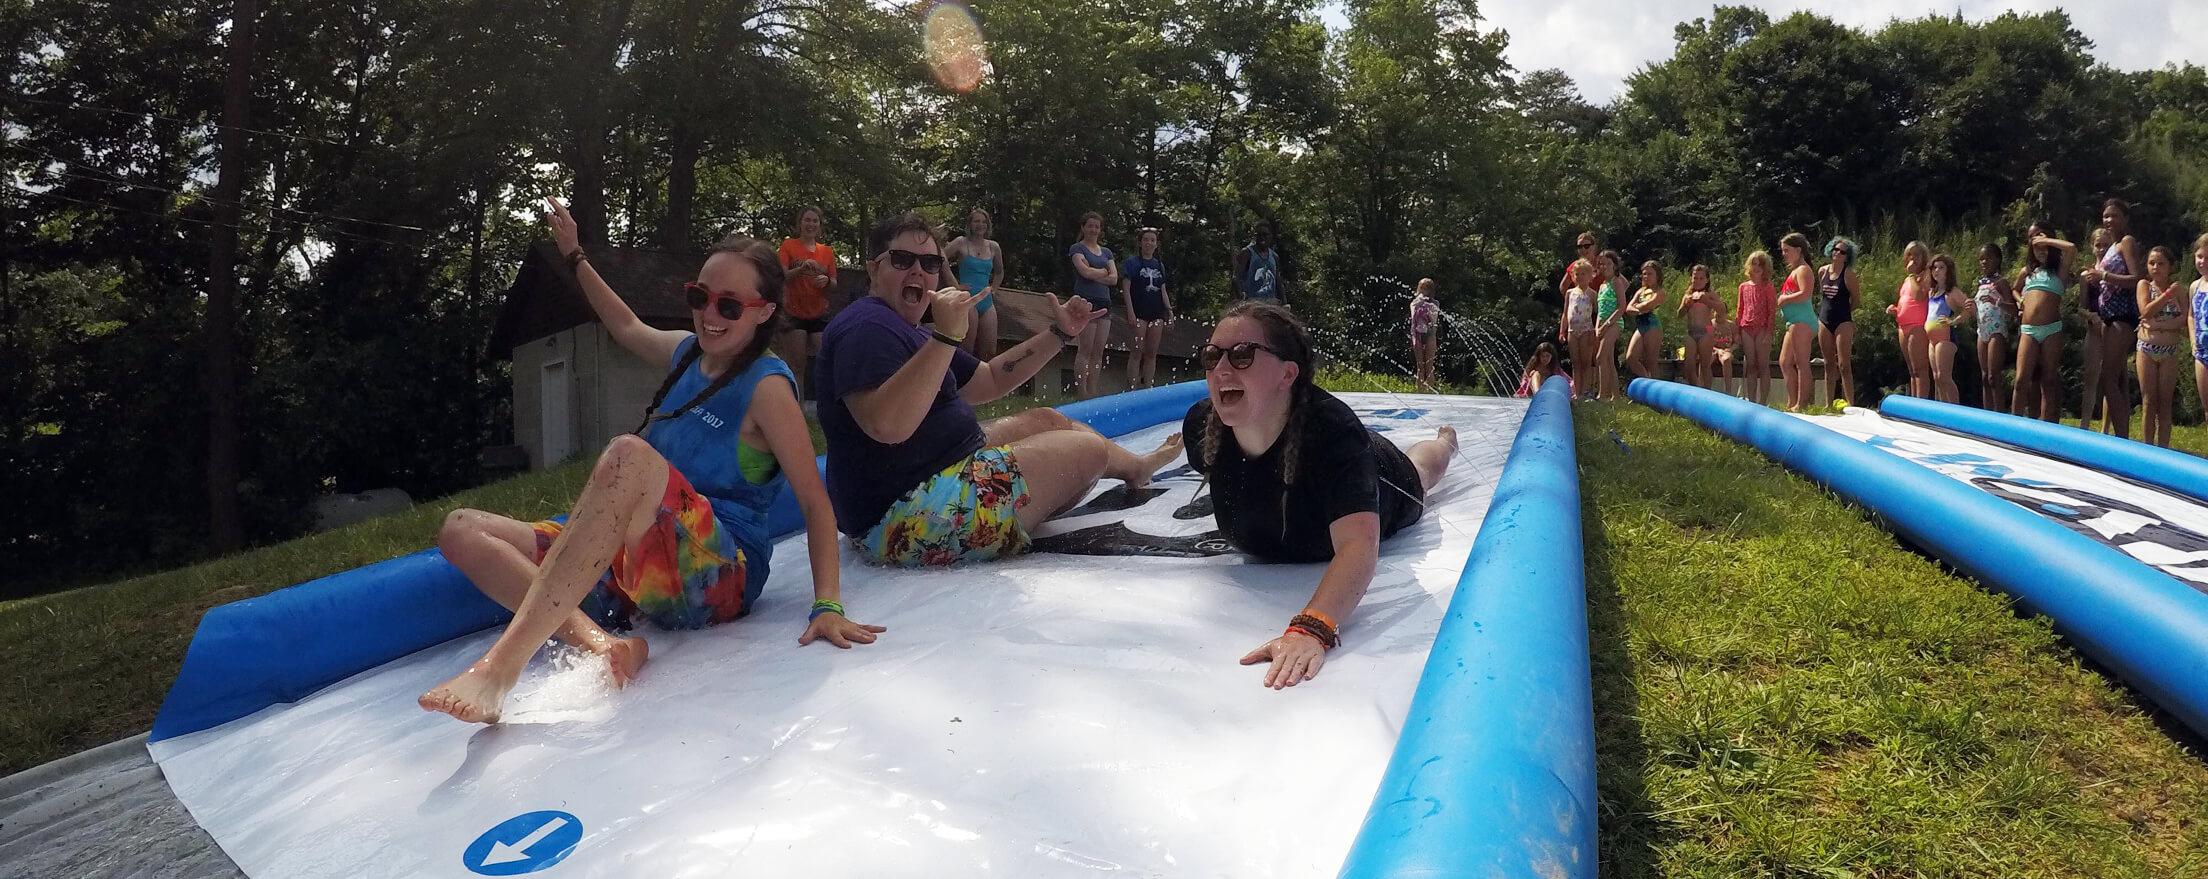 summer at camp in america header